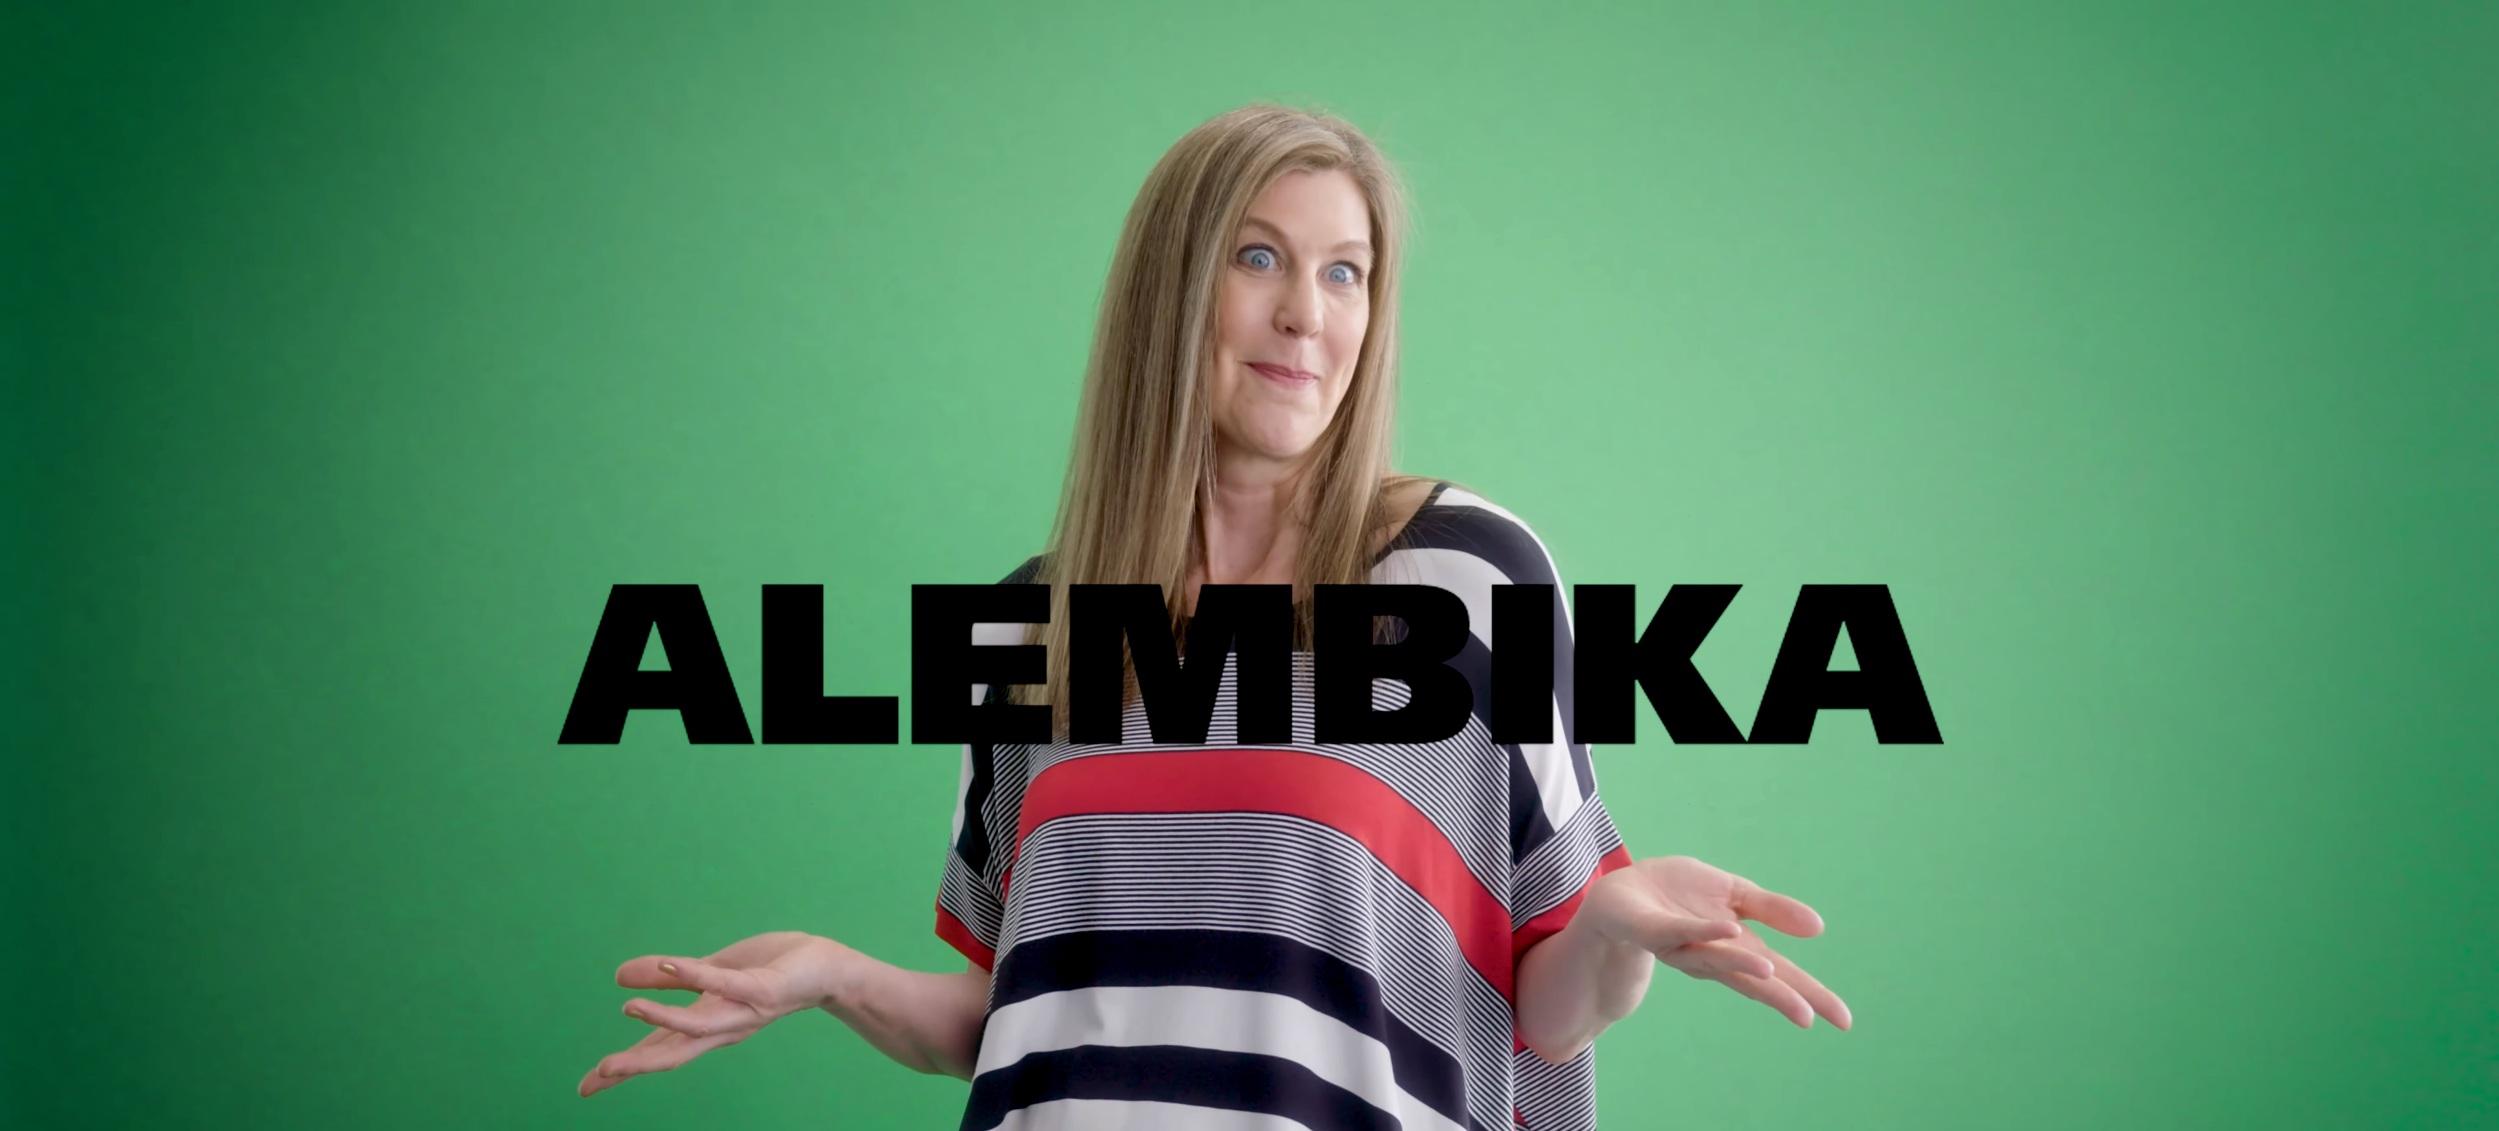 "Screenshotter--AlembikaSpring2019Heather-0'15"".png"